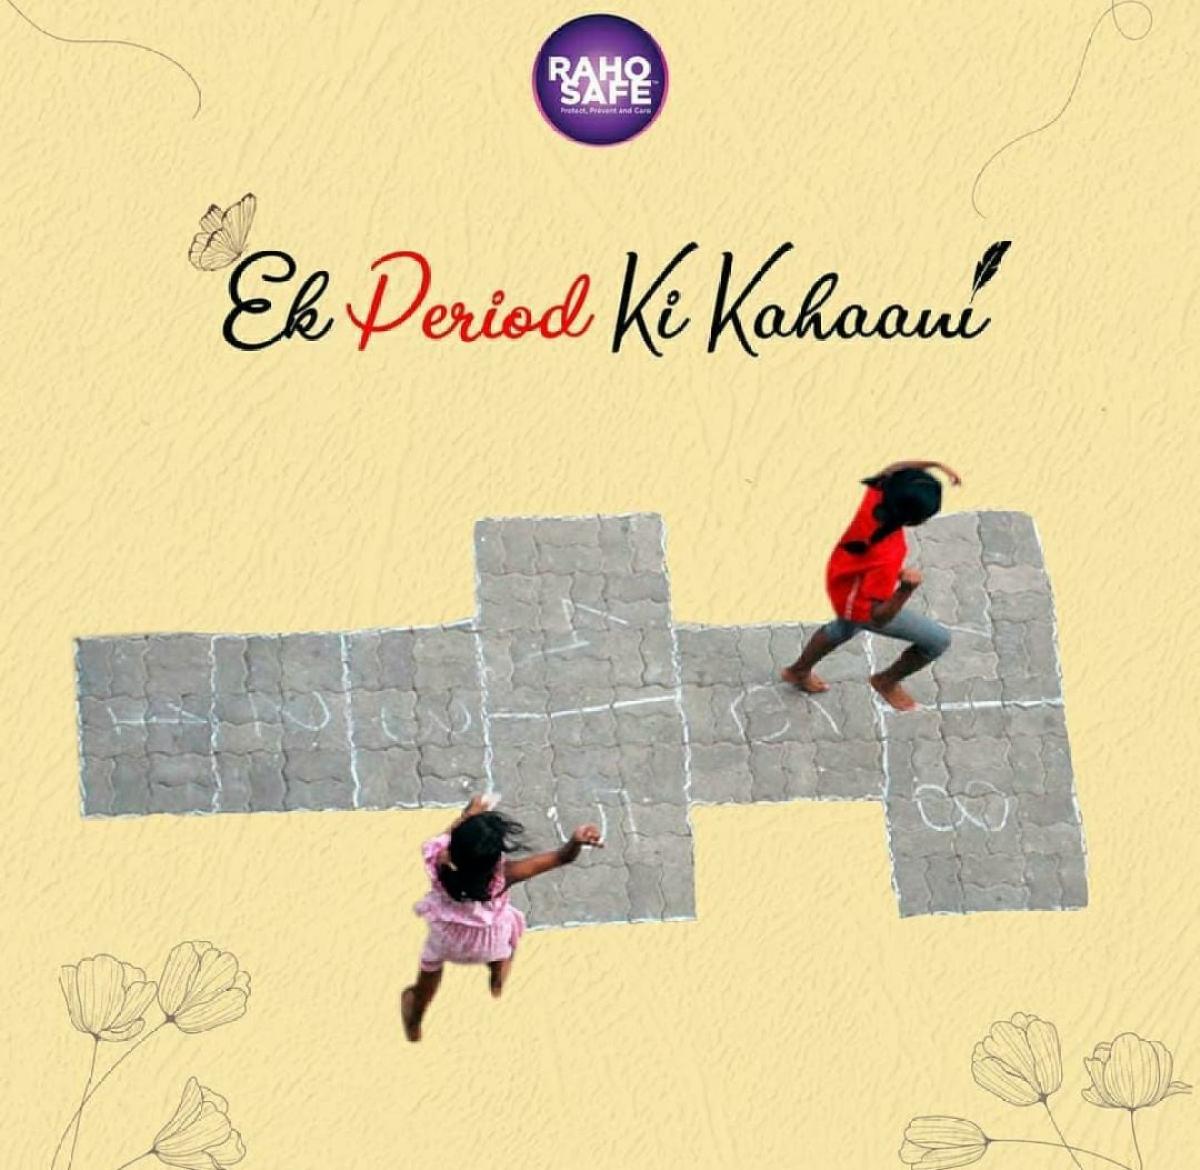 Raho Safe's #EkPERIODkikahani breaks stigma around menstruation